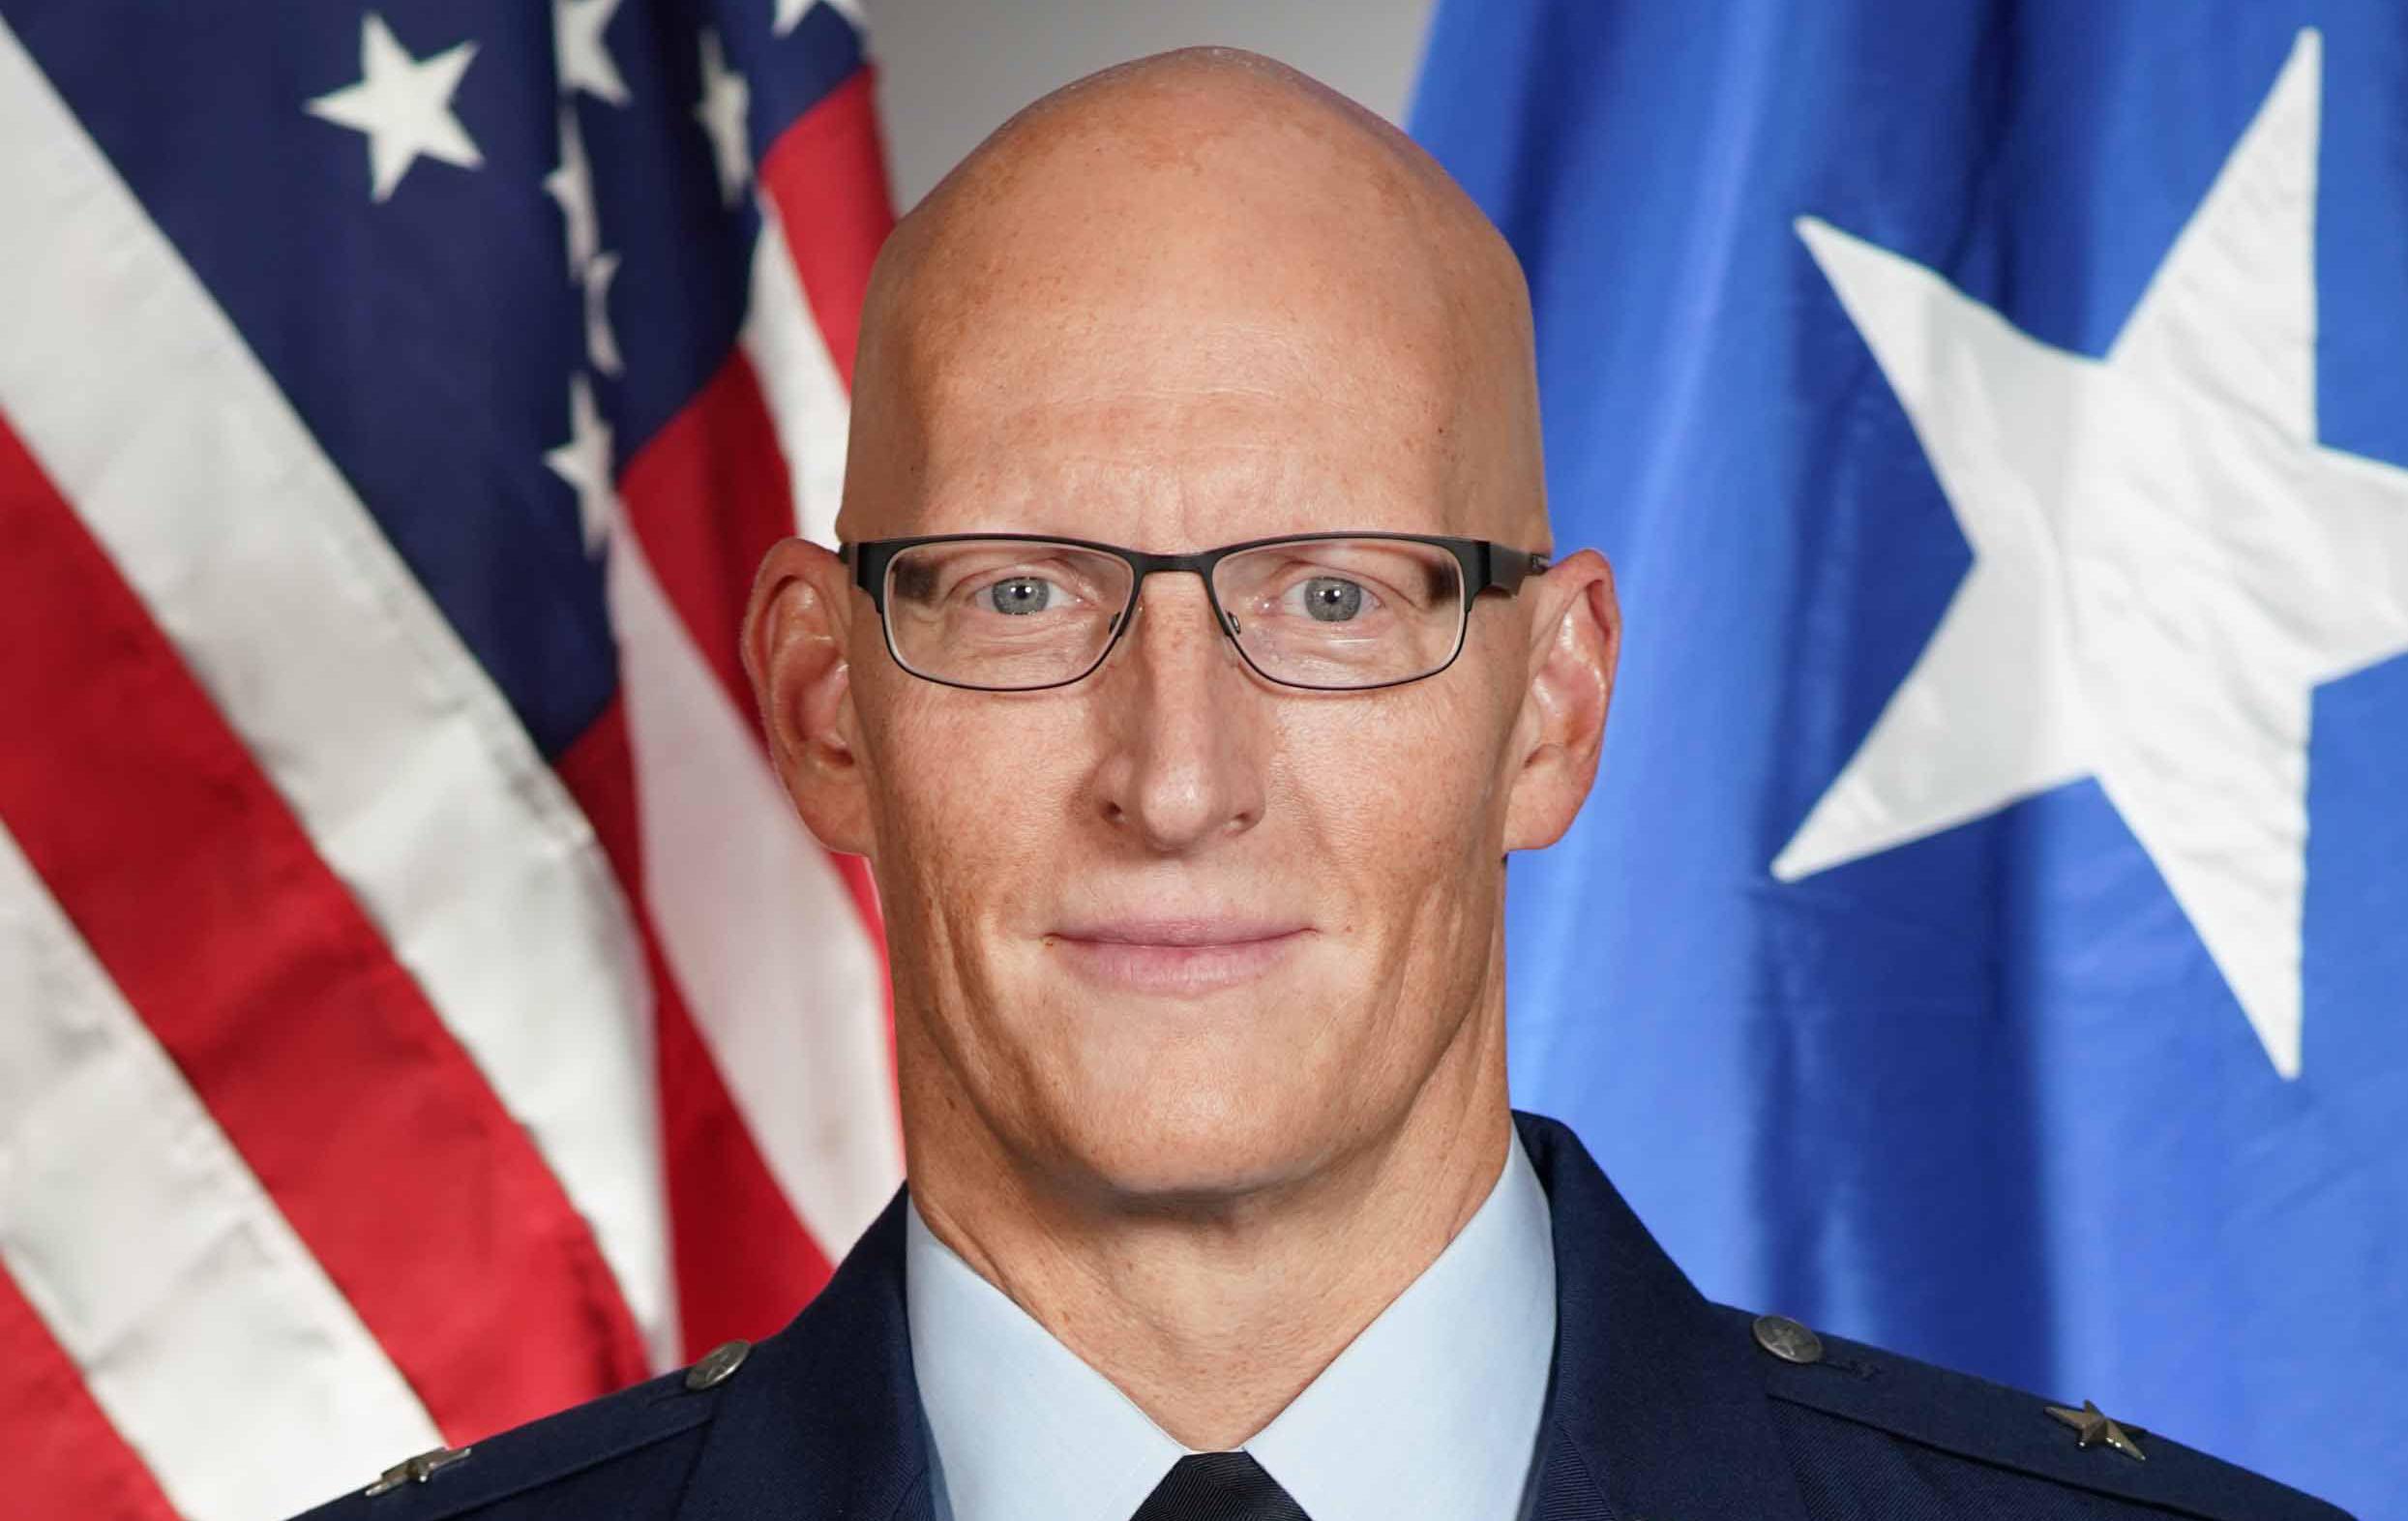 Brig. Gen. Joseph Harris II